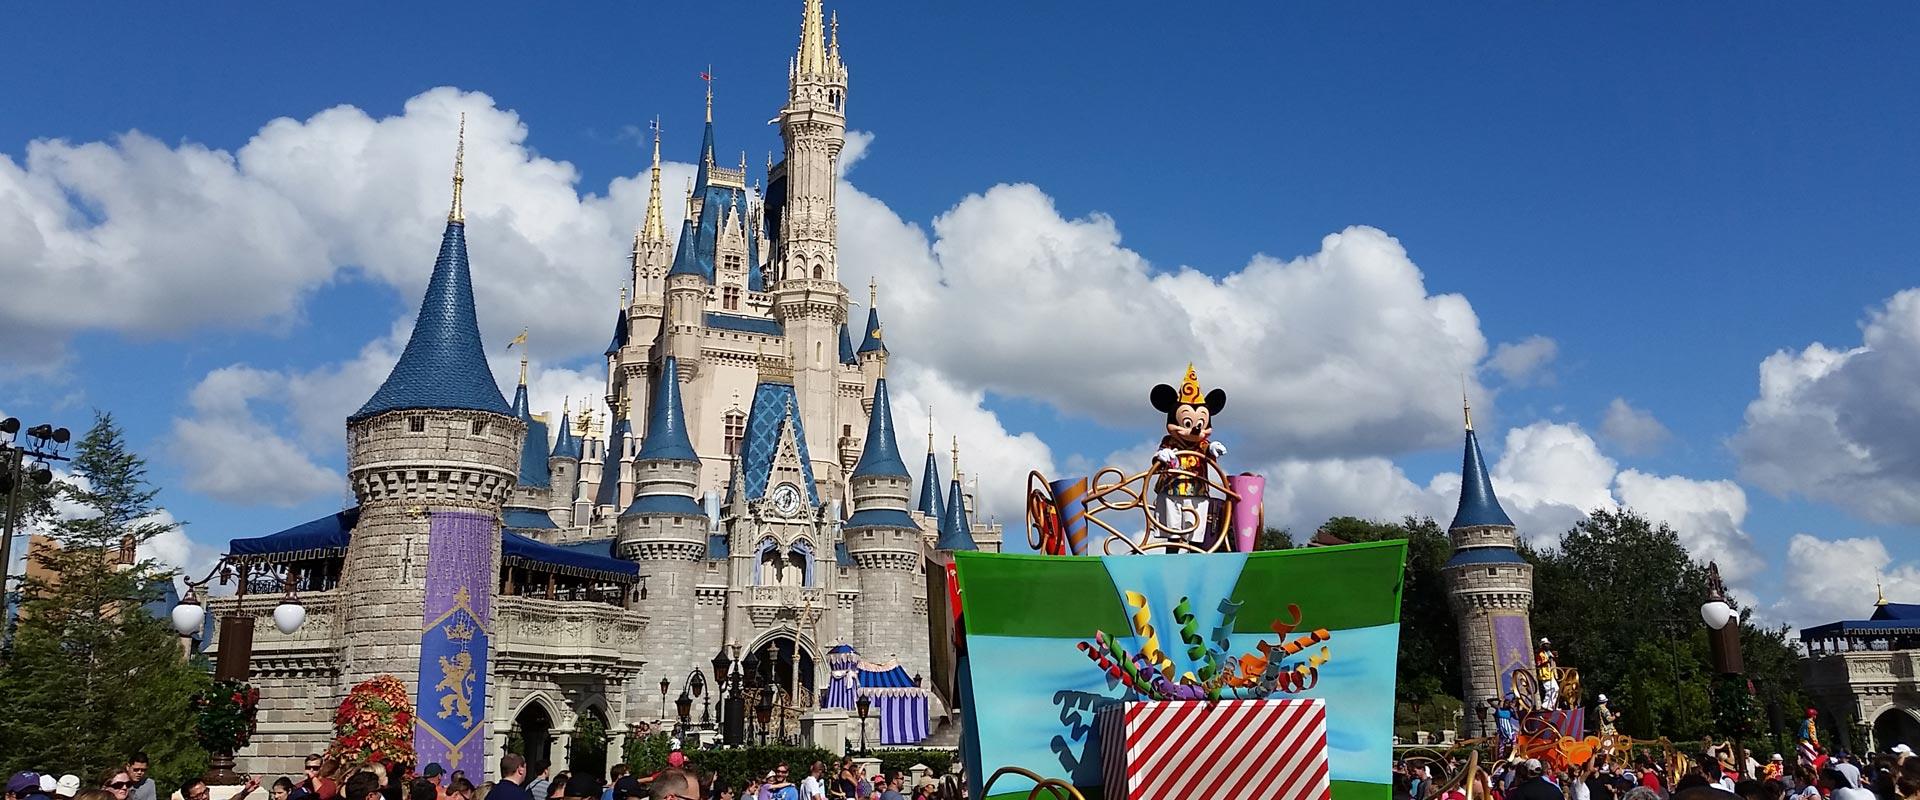 Disney Cinderella's Castle - private Disney VIP tours